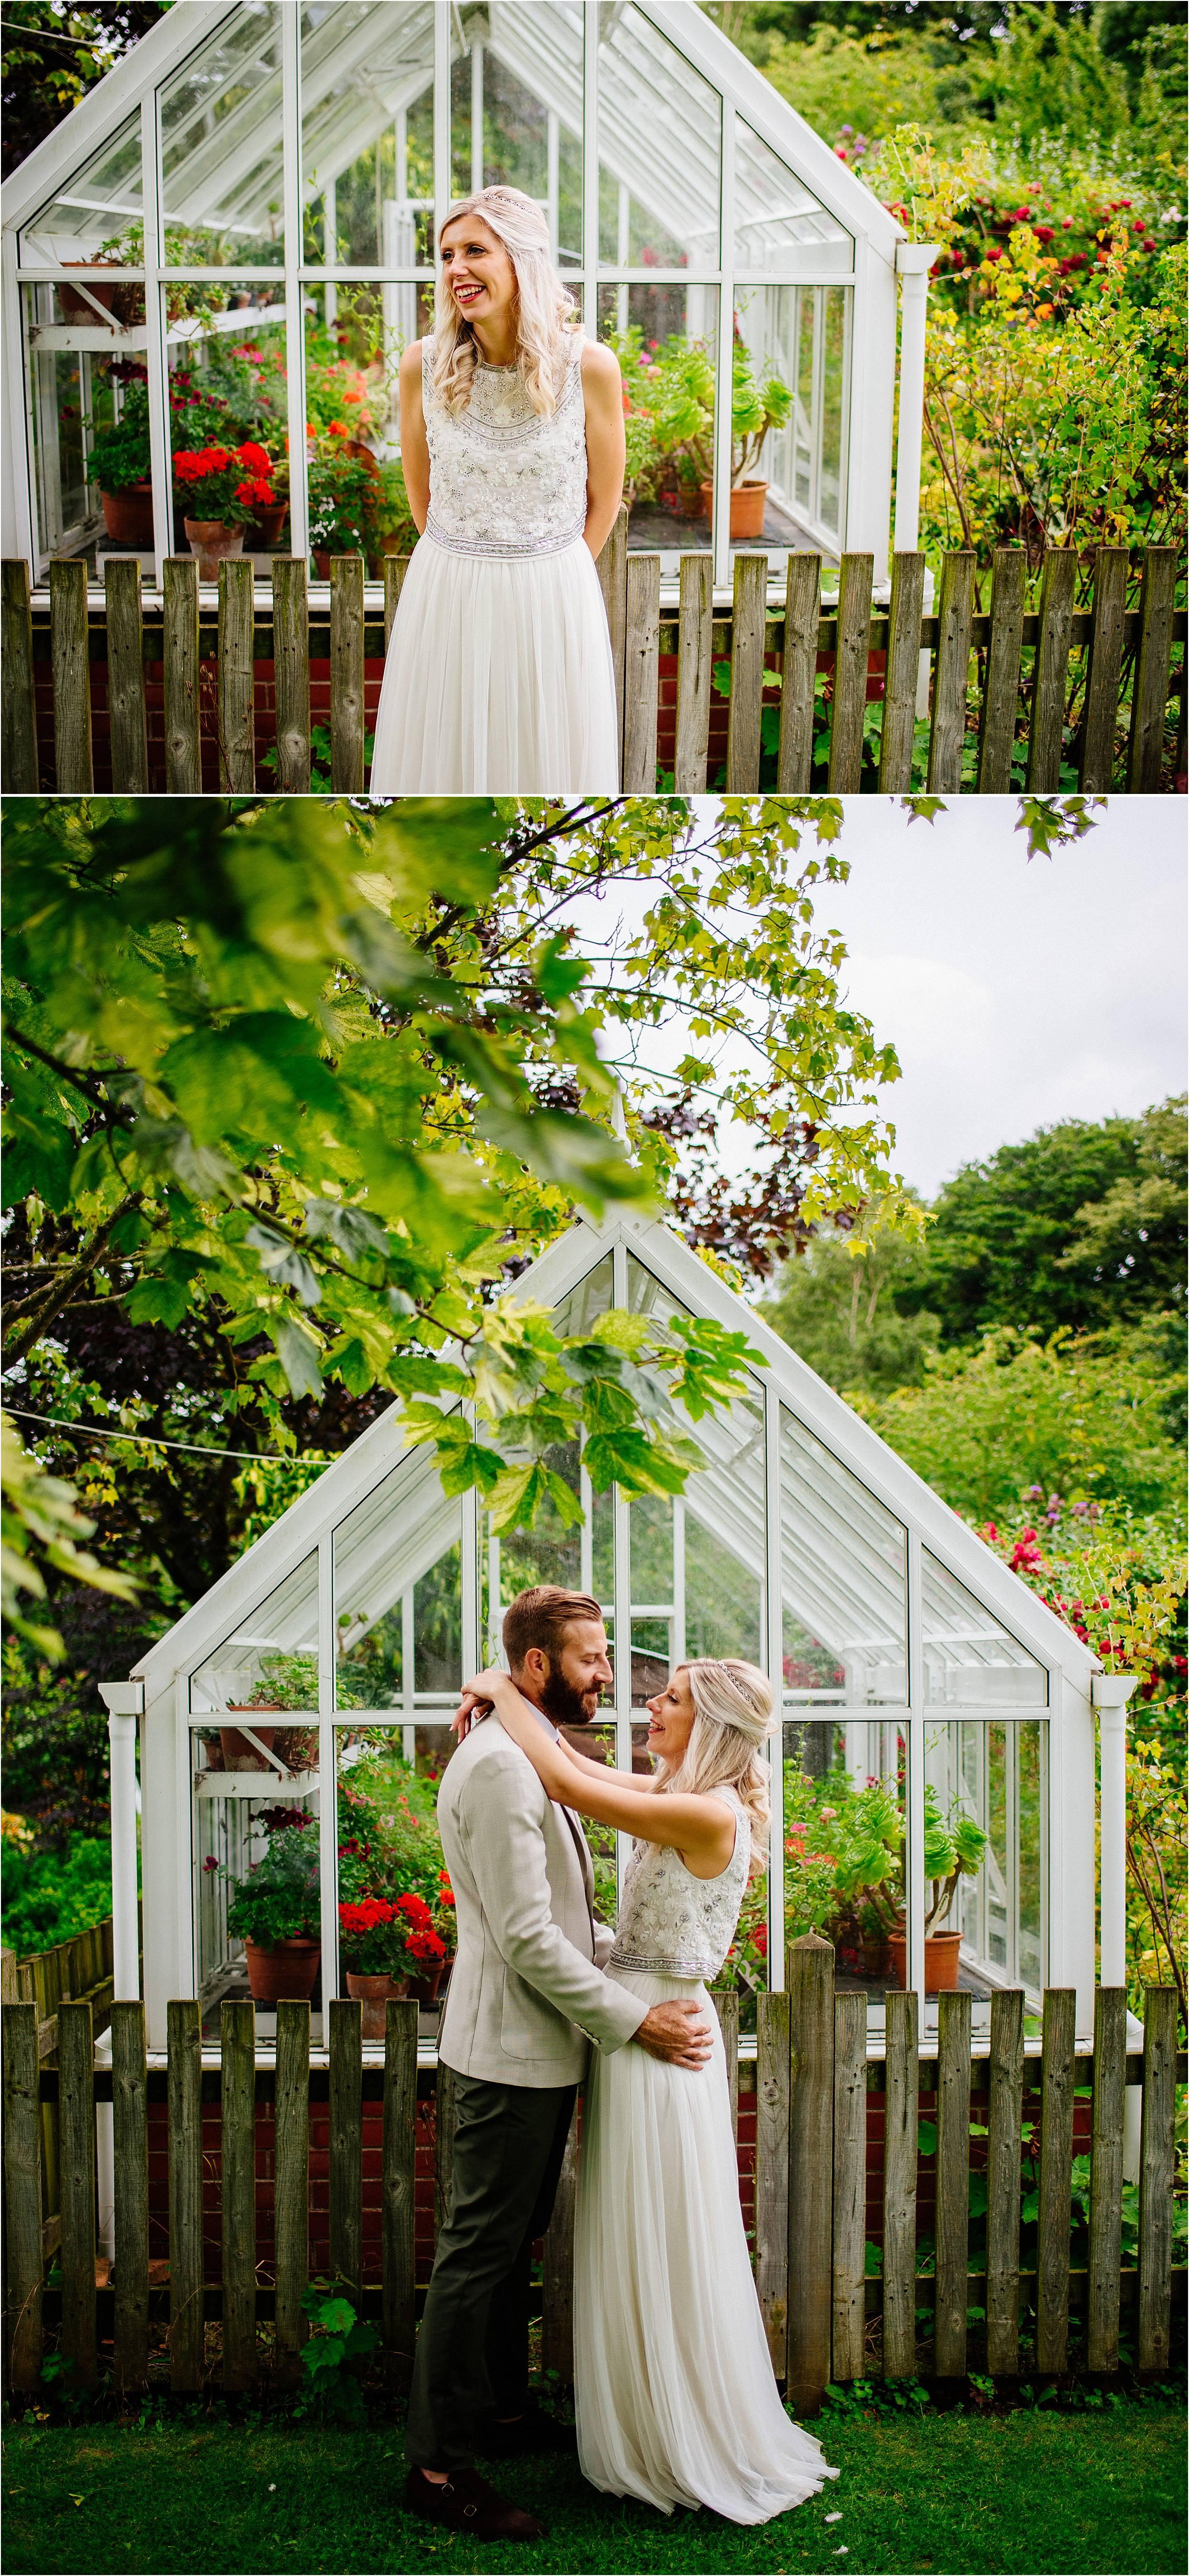 Barnsdale Gardens Wedding Photographer_0055.jpg